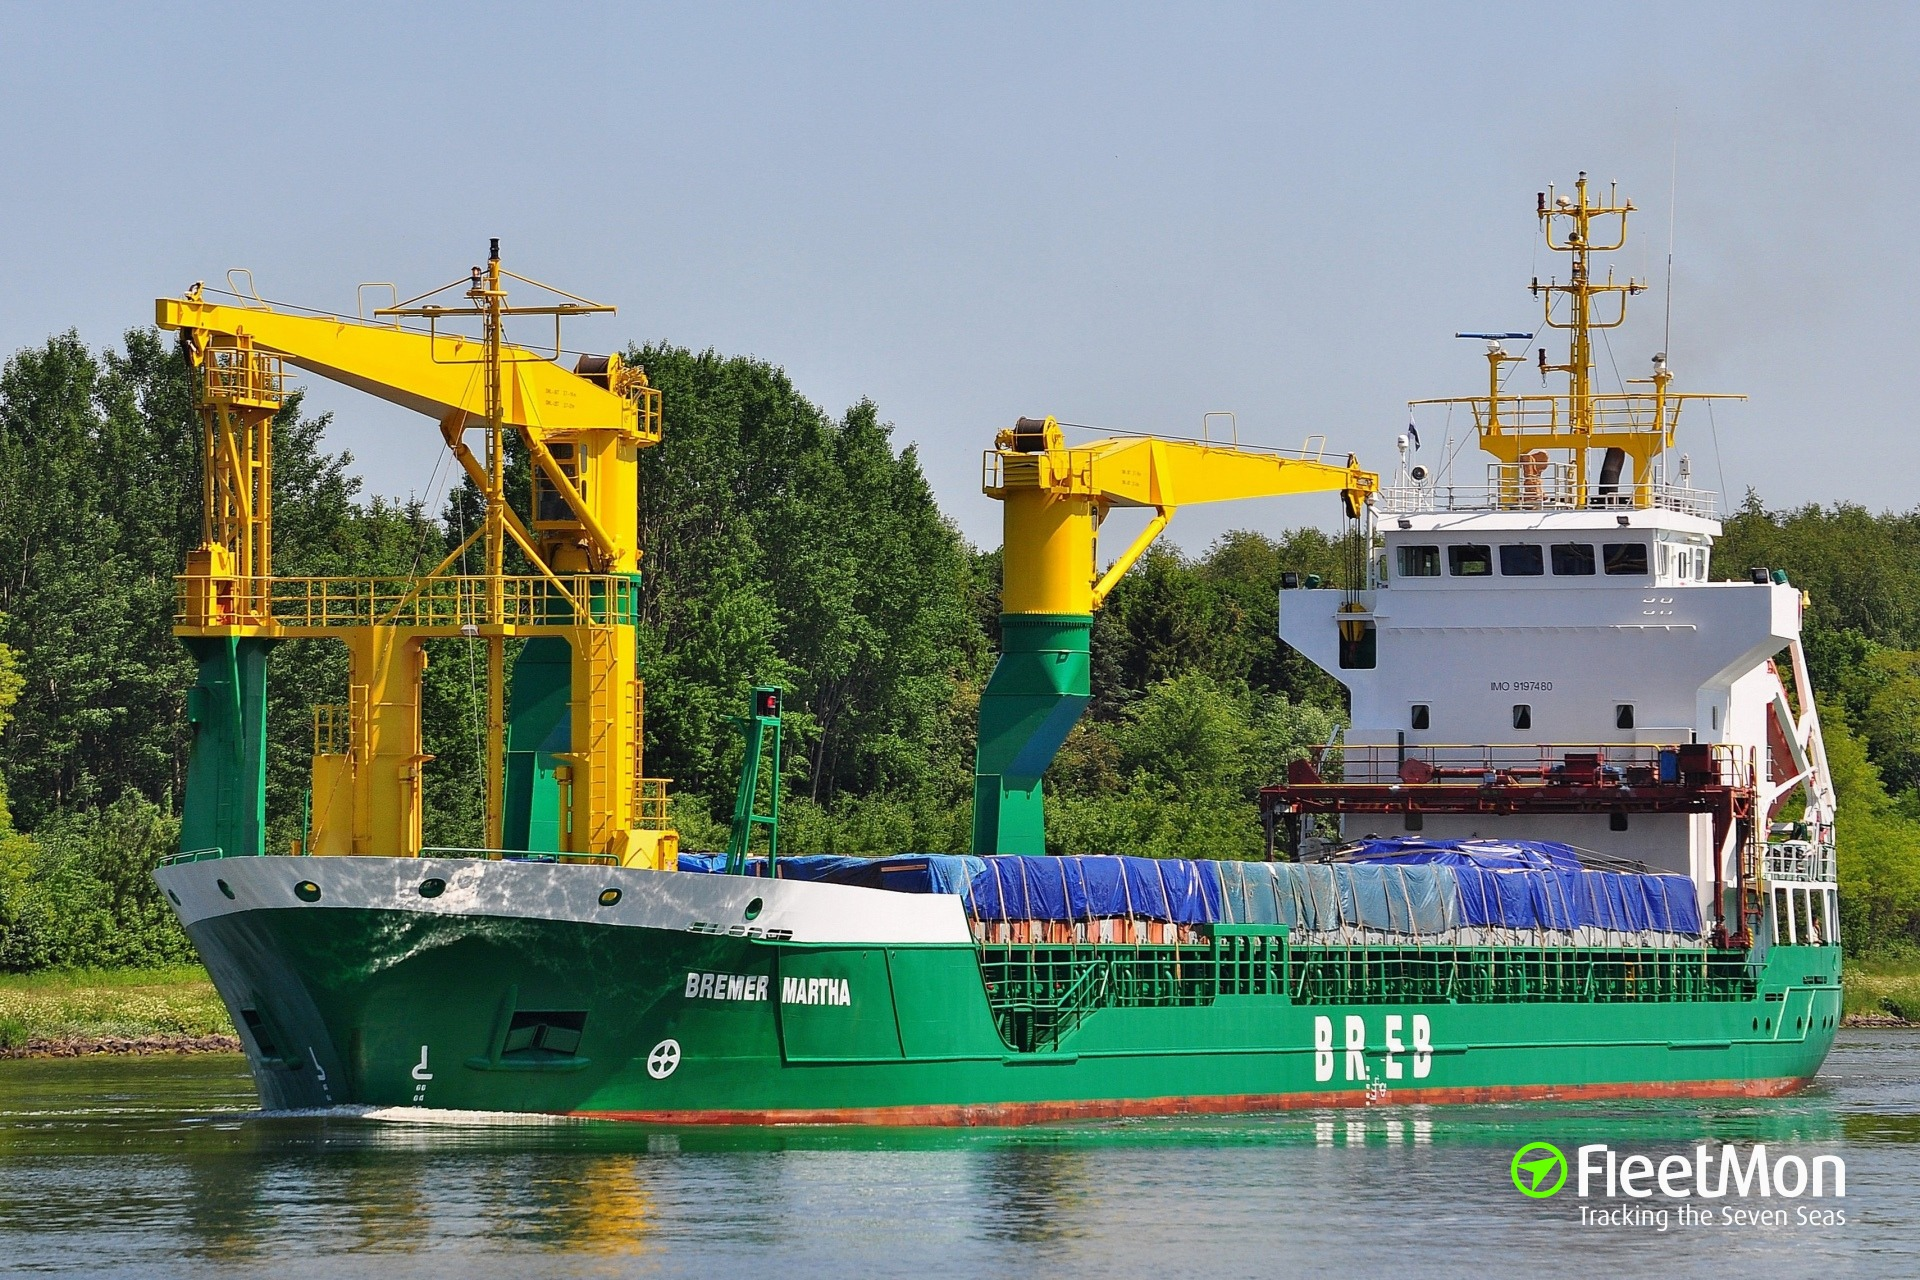 Two-ship mishap in Kiel Canal